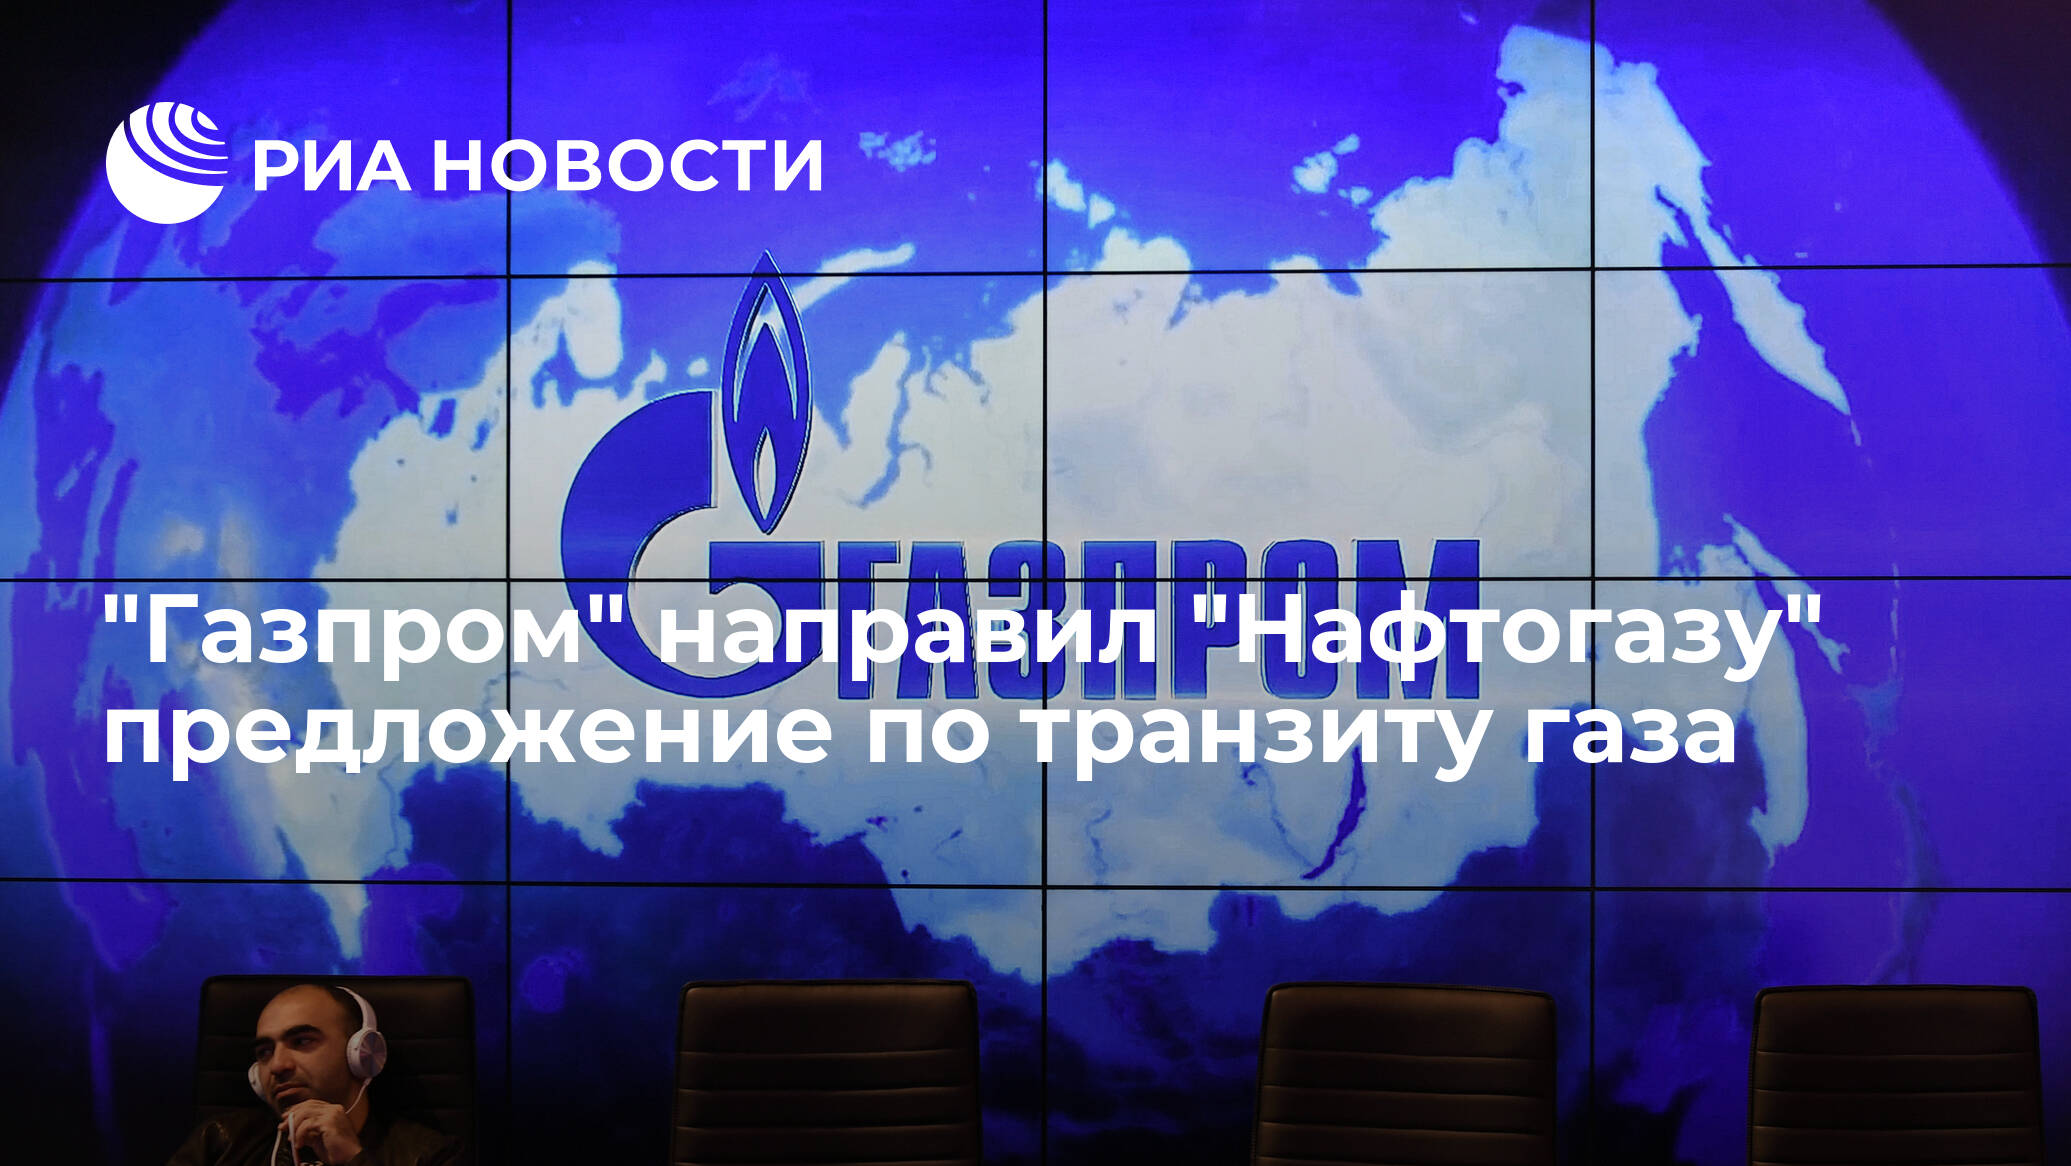 """Газпром"" направил ""Нафтогазу"" предложения по транзиту - РИА Новости, 18.11.2019"